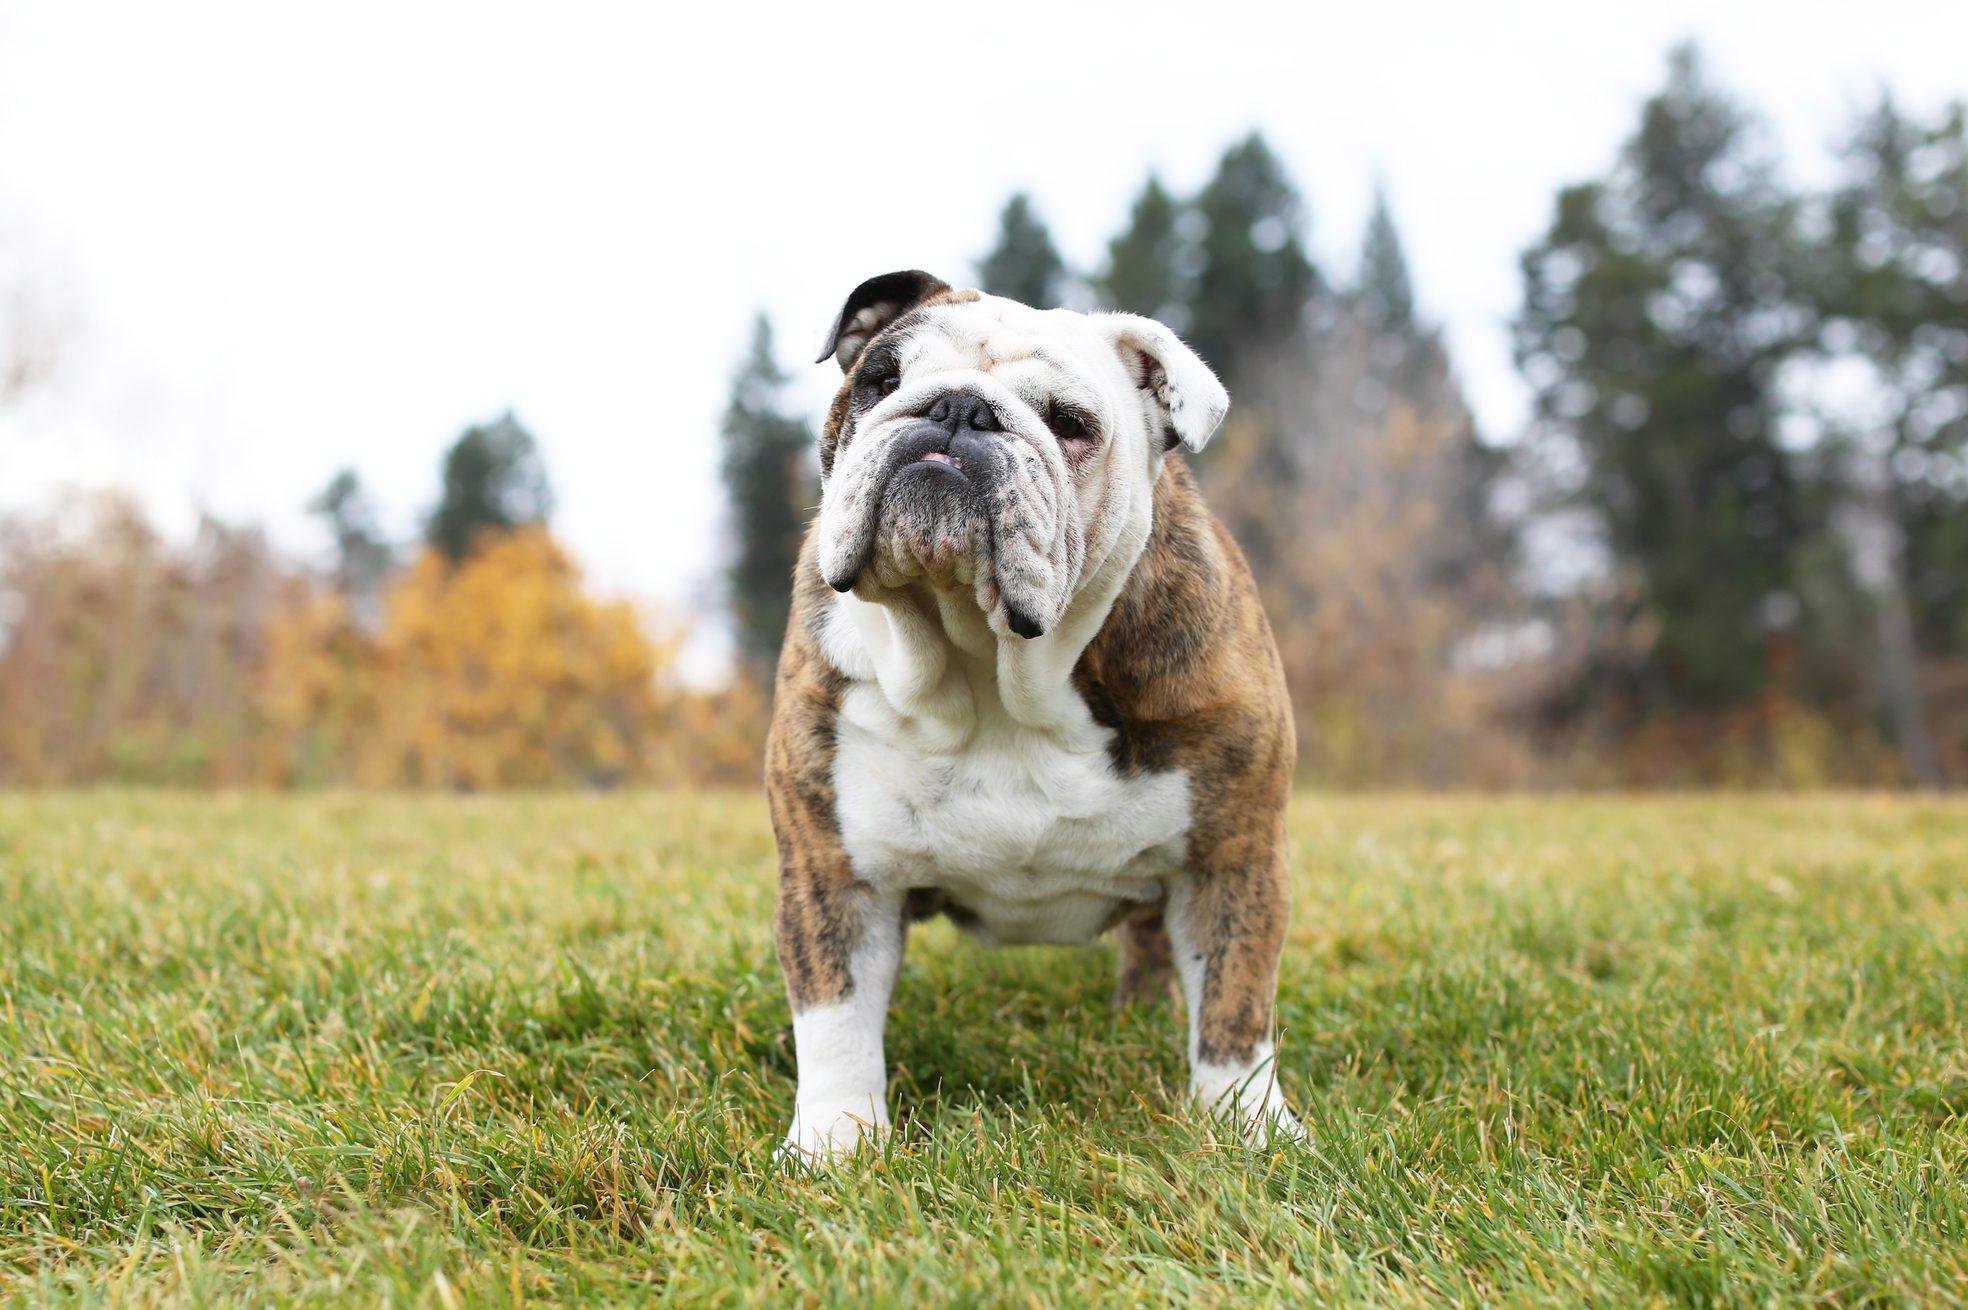 Portrait of bulldog standing on park grass